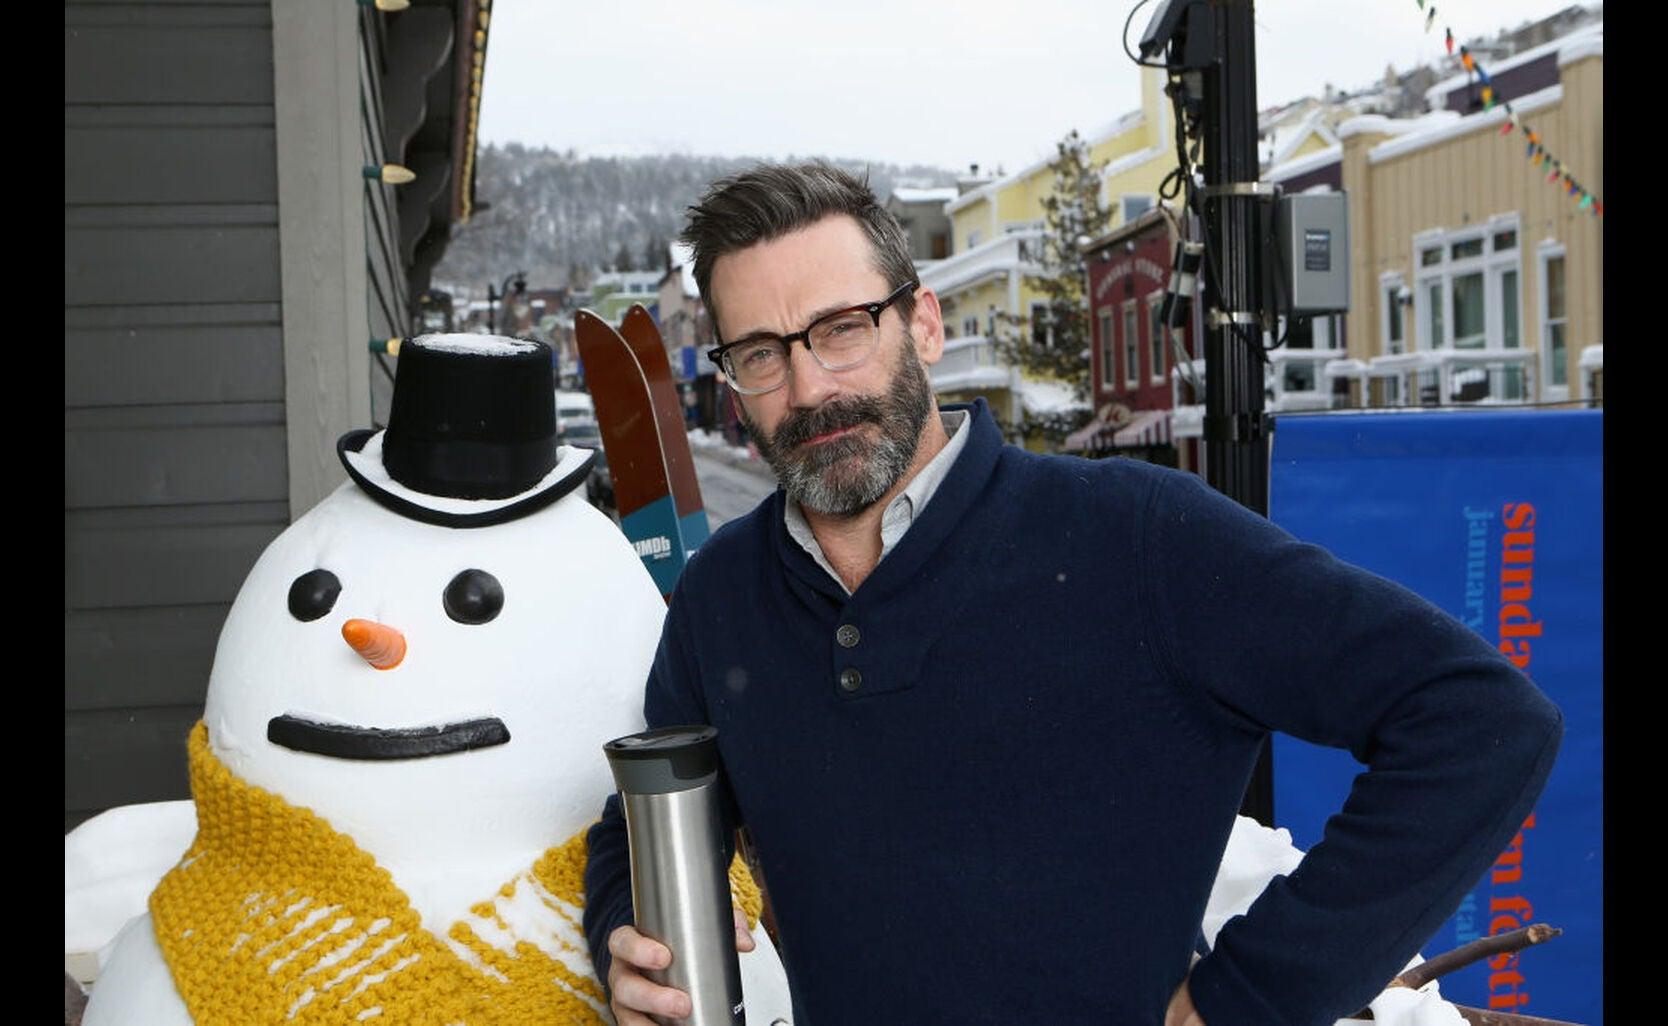 actor Jon Hamm at Sundance 2018